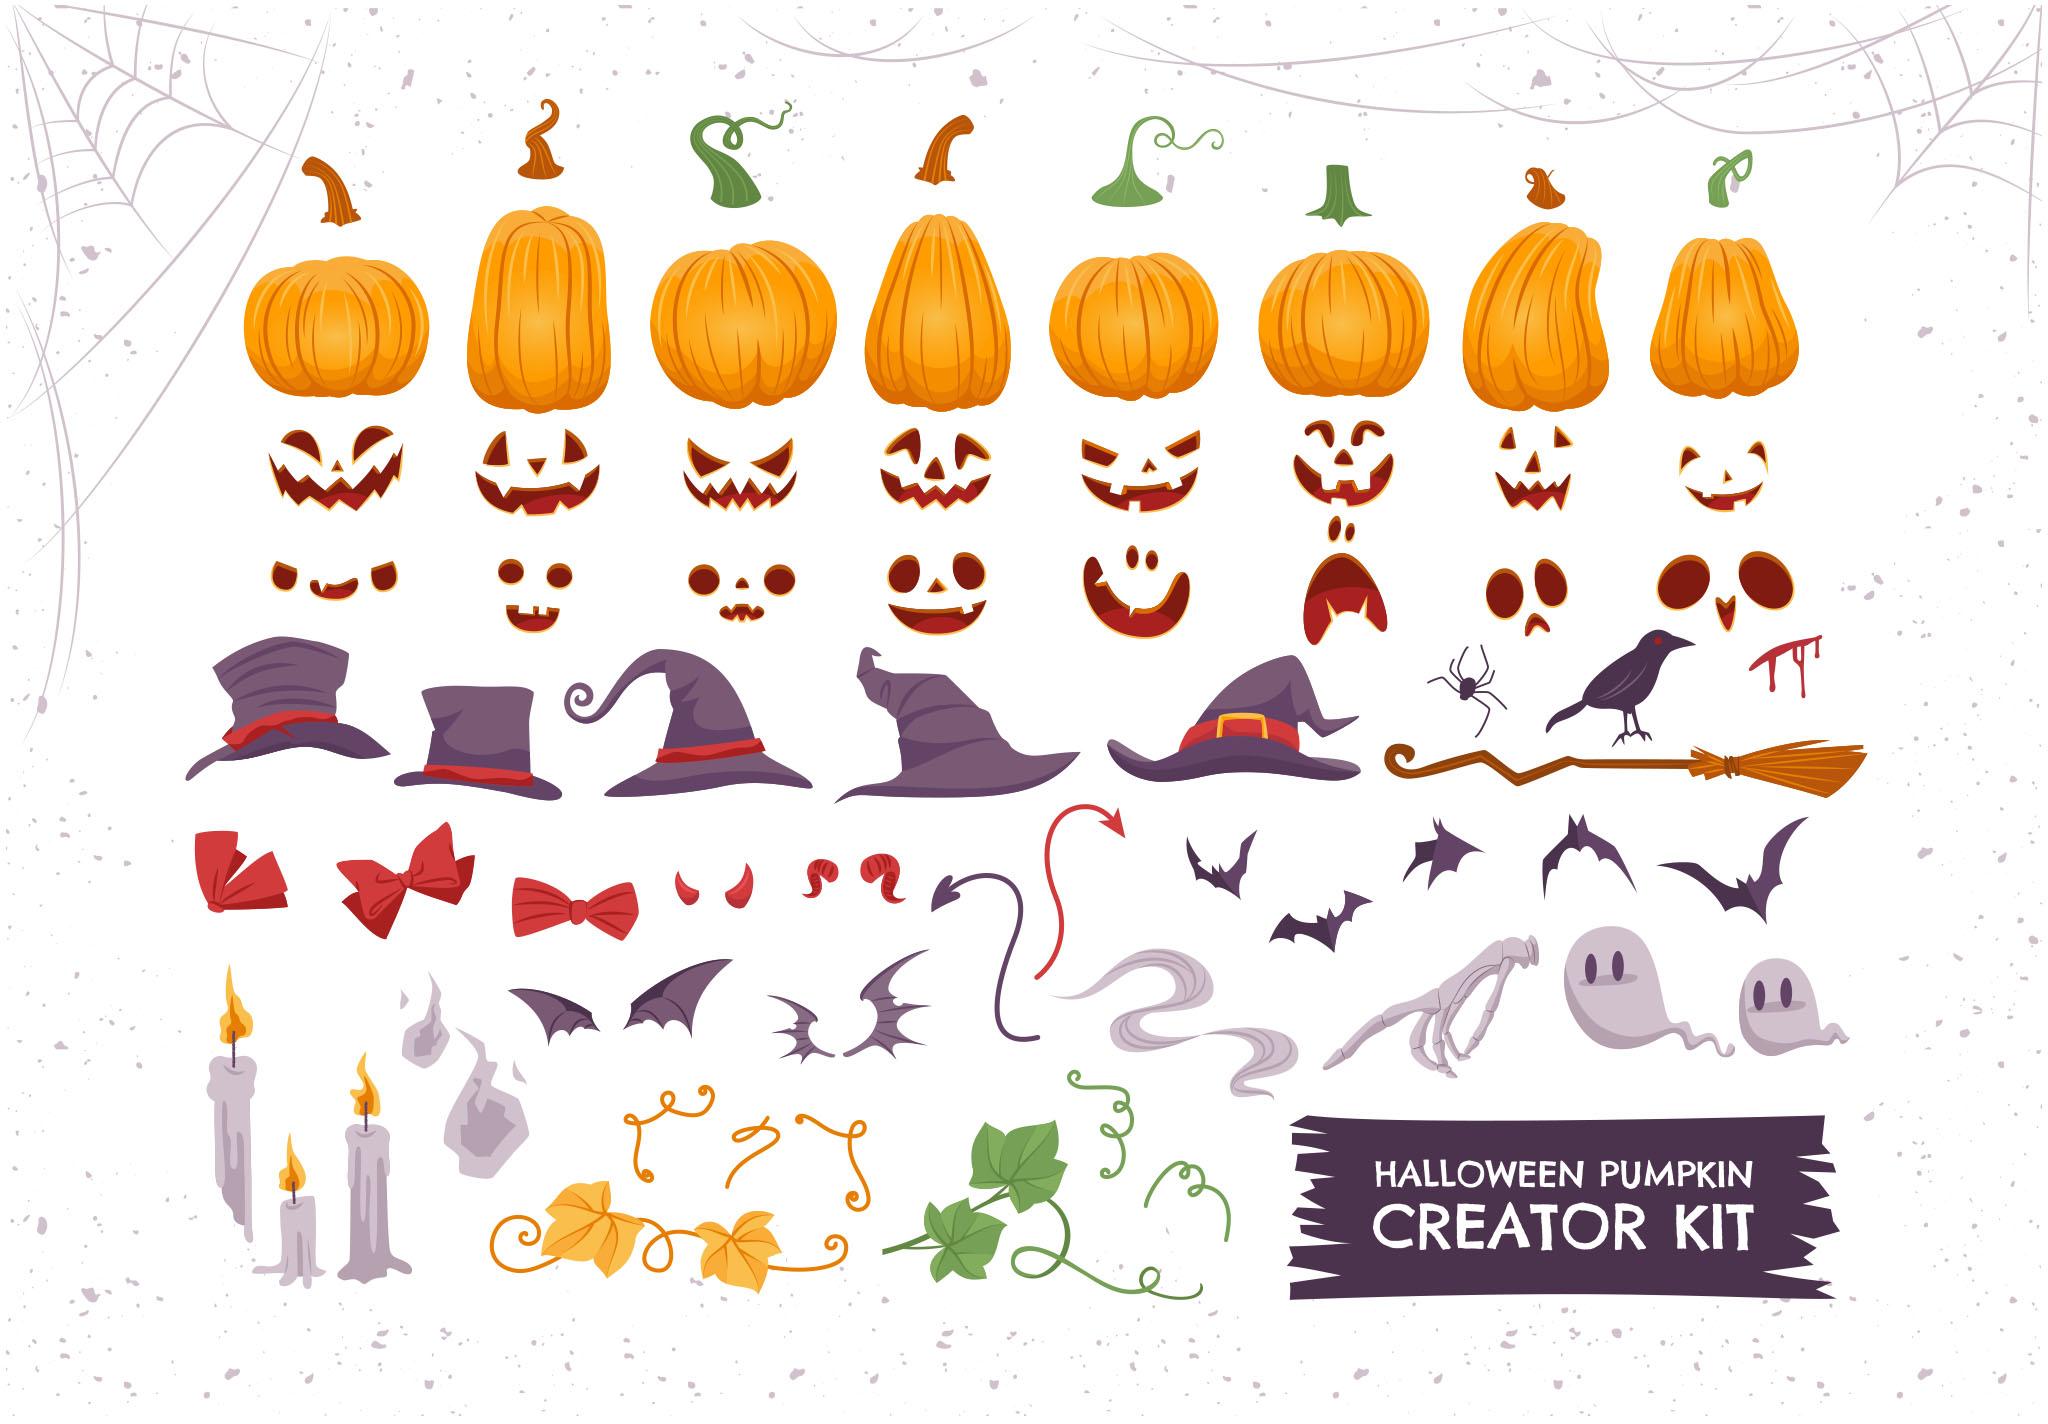 Halloween Pumpkin Vector Illustrations for Photoshop & Illustrator